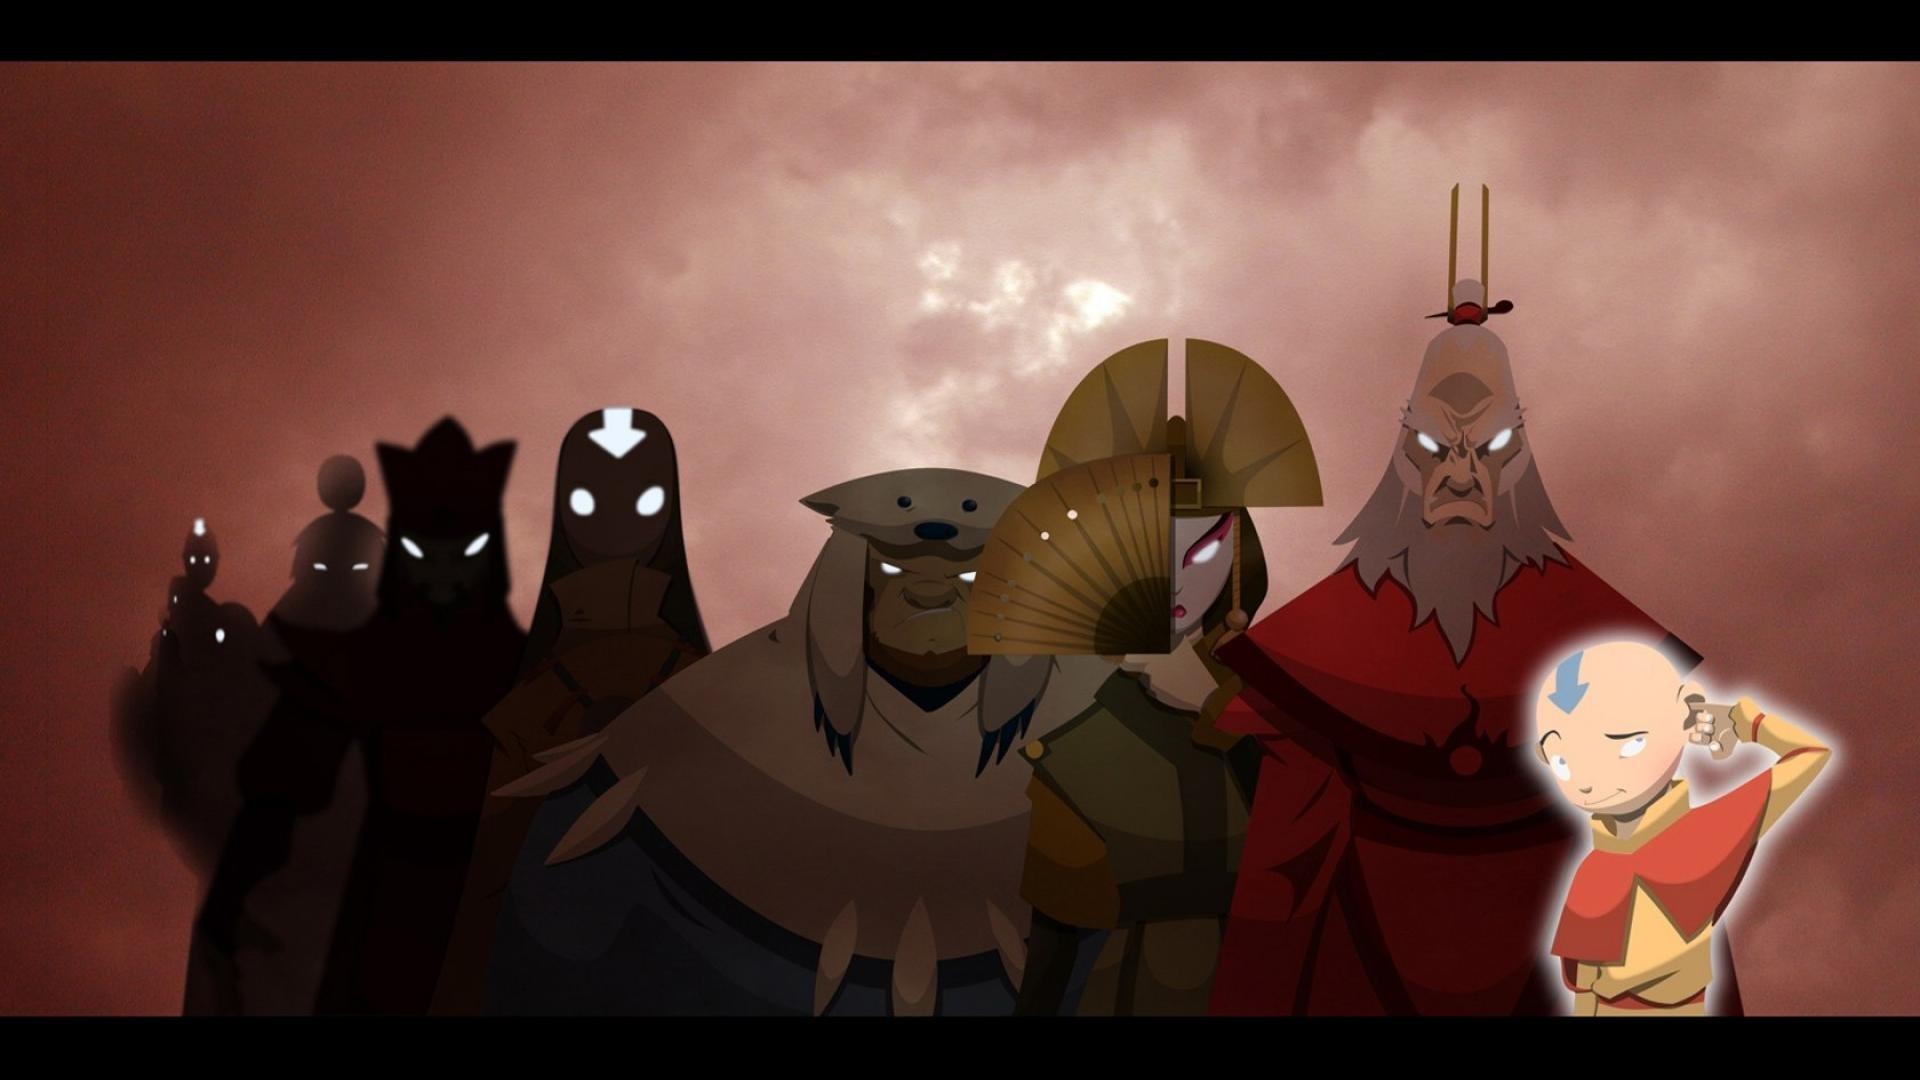 1350x2063 The Legend Of Korra Firelord Zuko